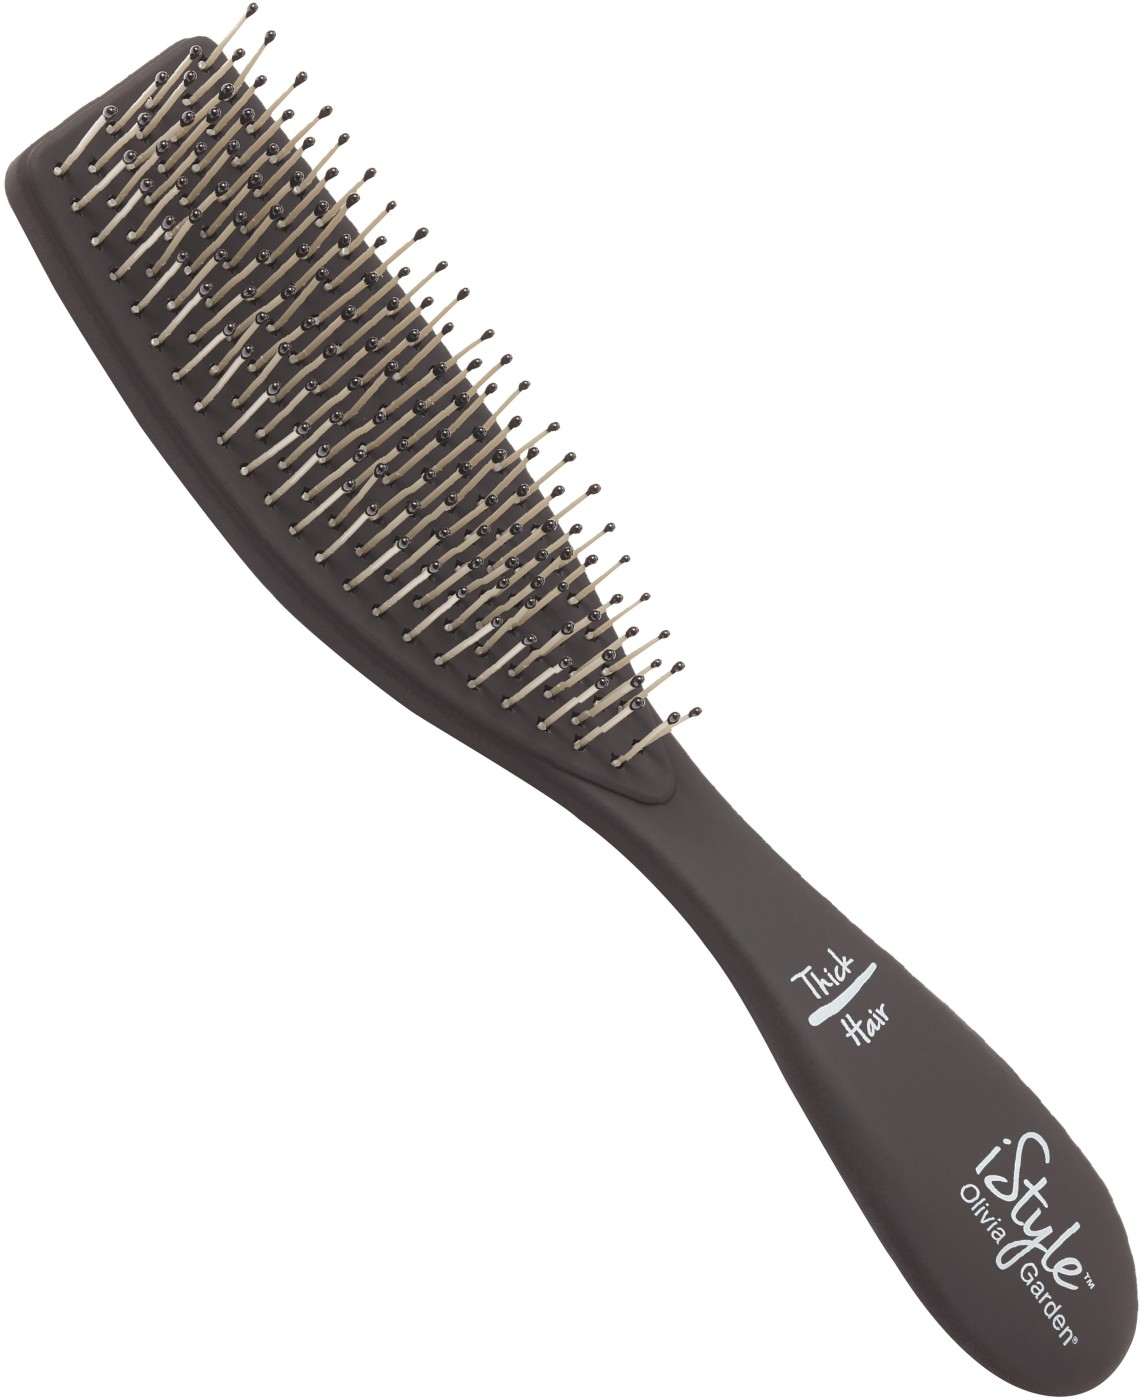 Olivia Garden iStyle für dickes Haar B-2216